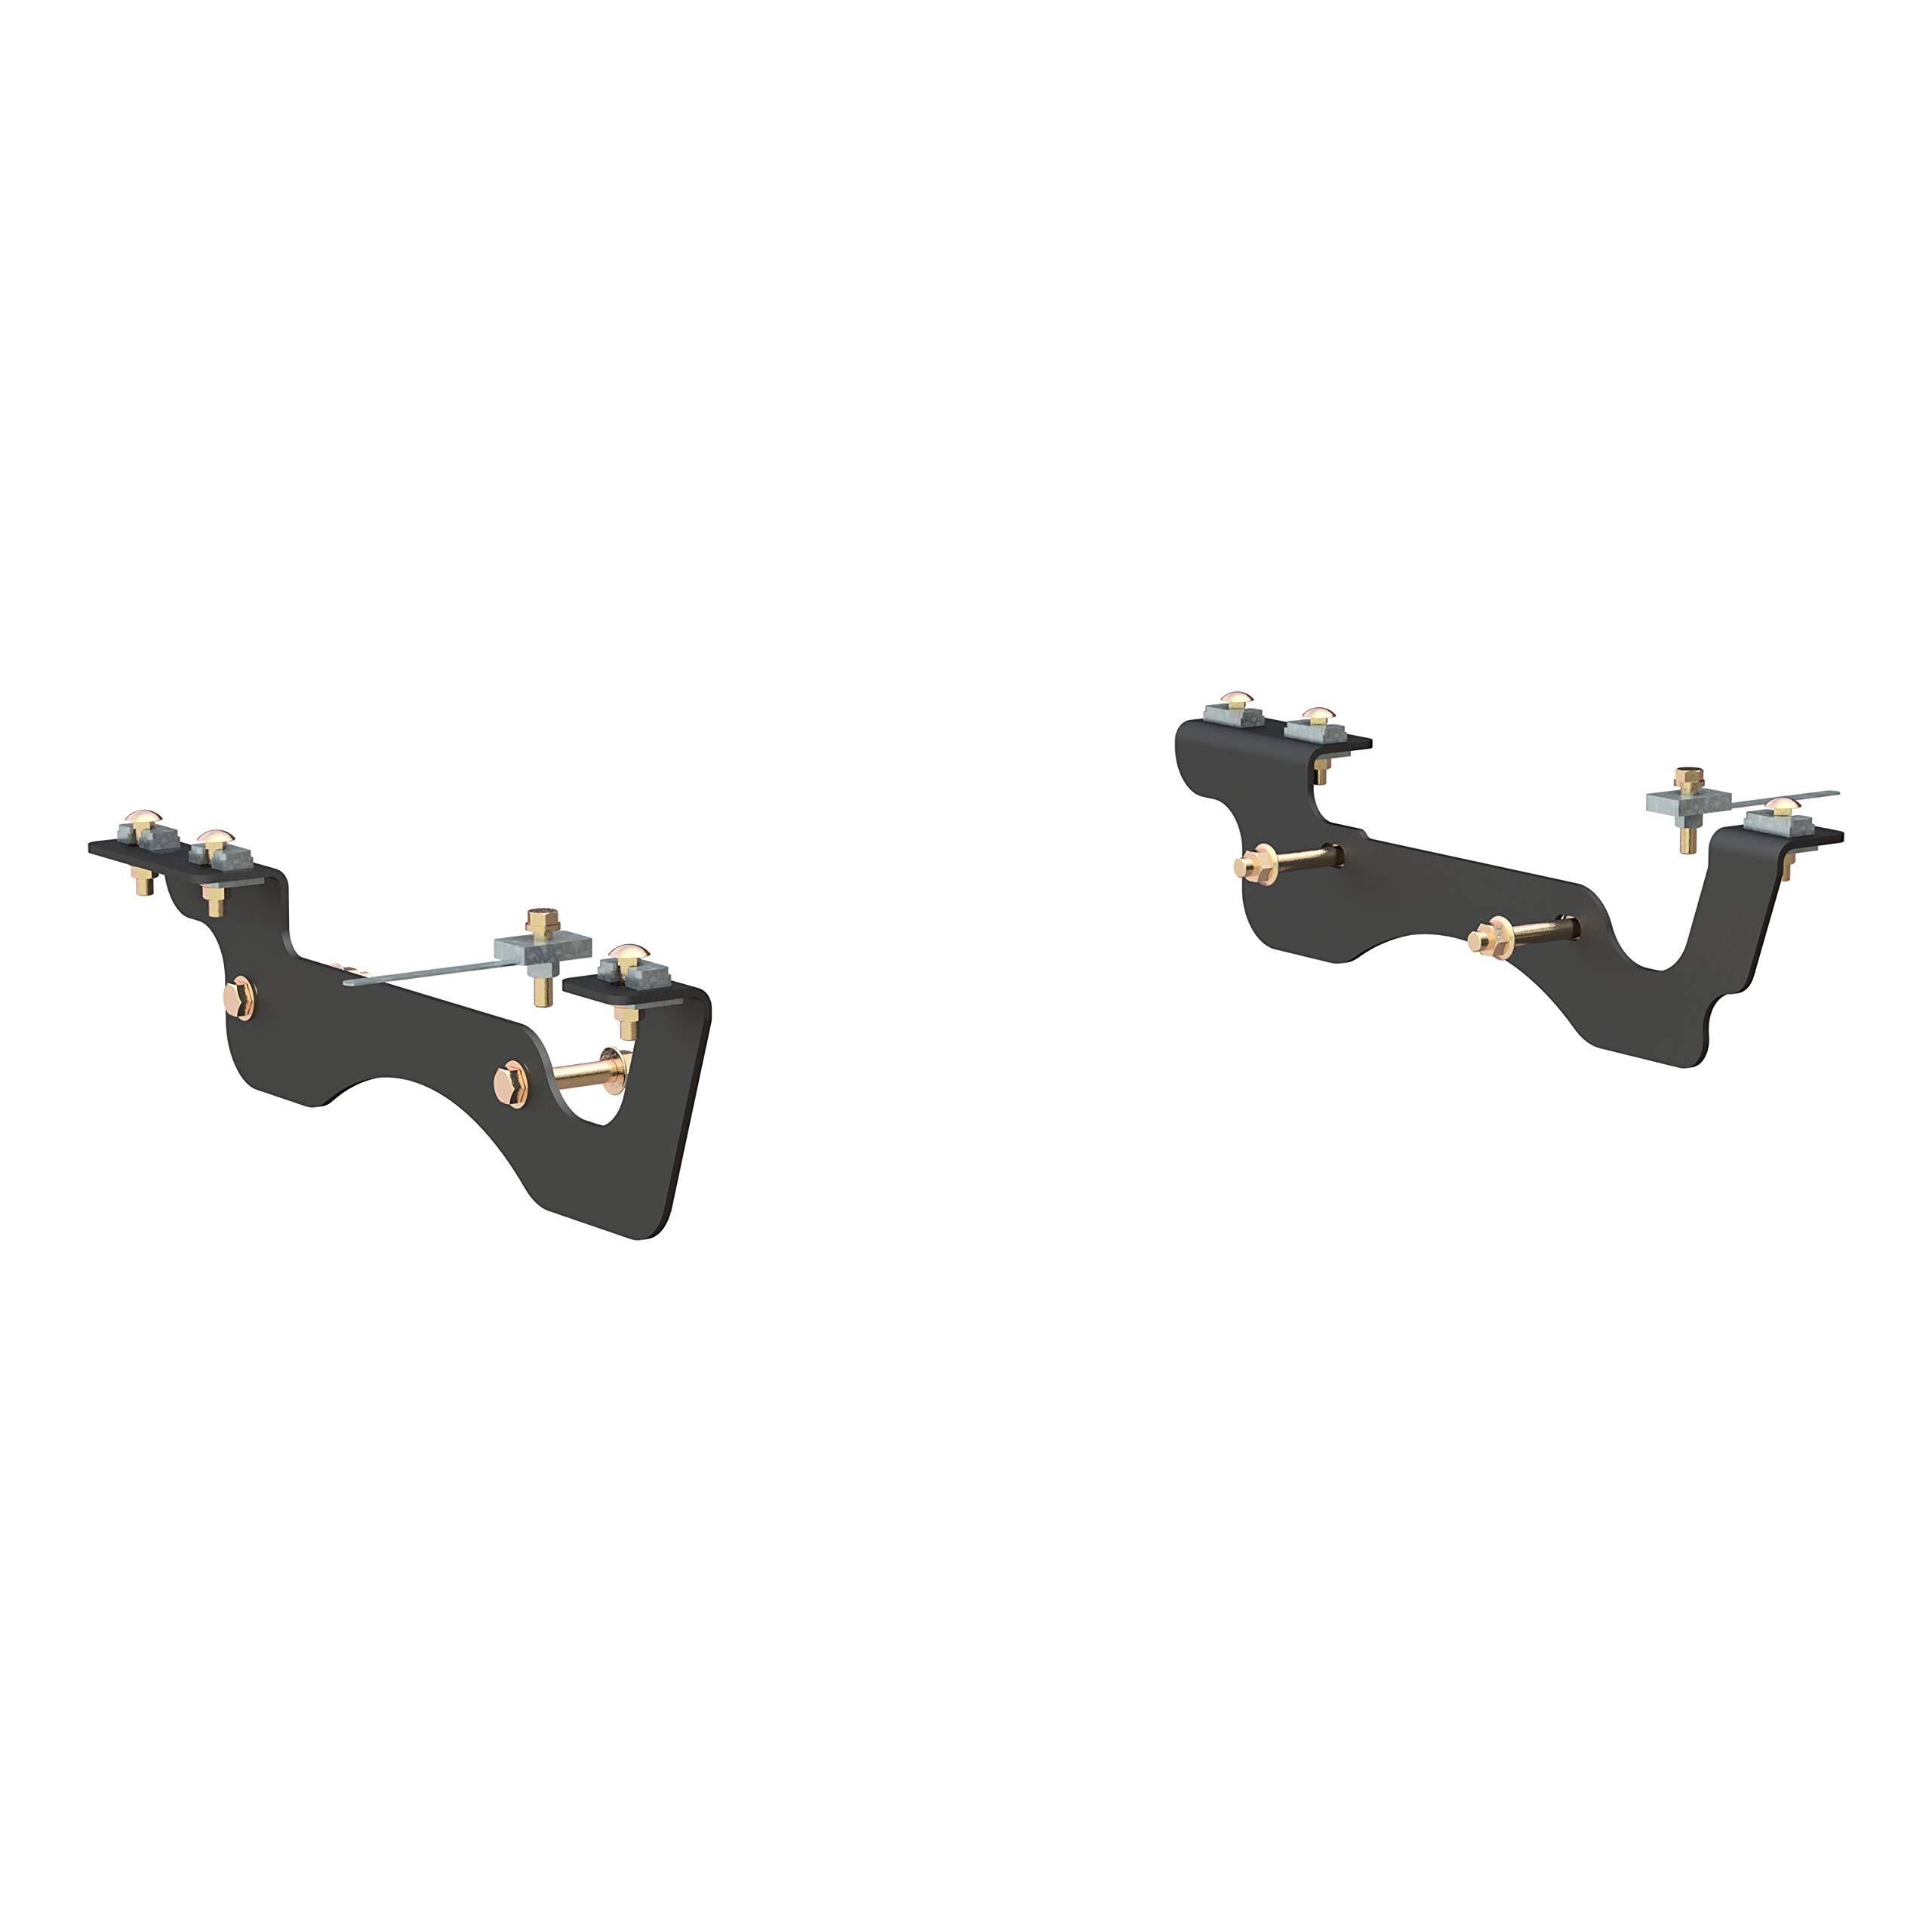 CURT 16428 5th Wheel Hitch Installation Brackets for Select Ford F-250, F-350, F-450 Super Duty